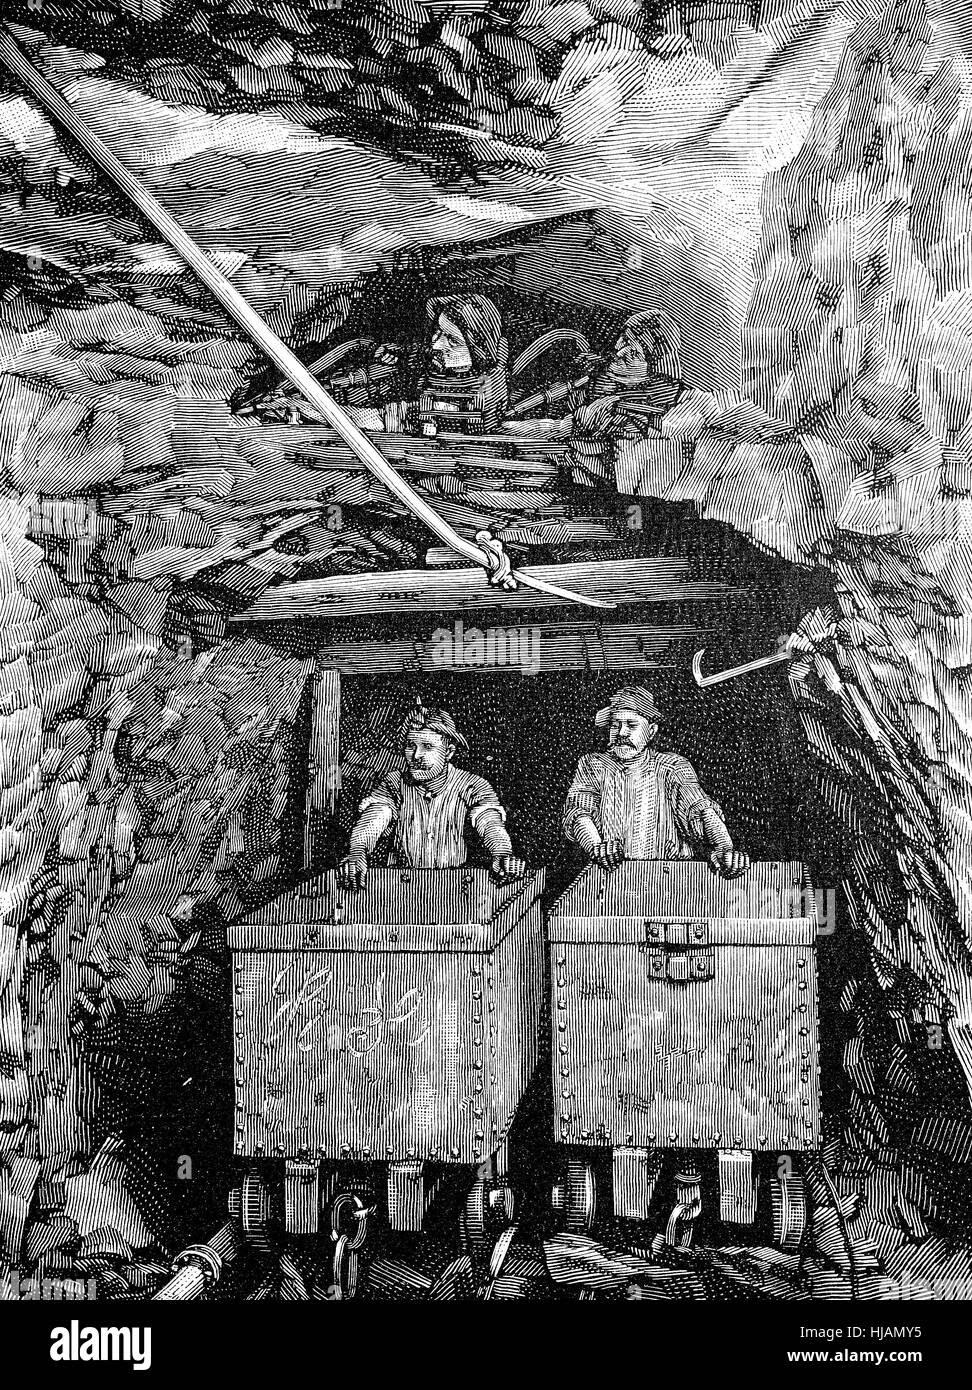 Slate Mining Stockfotos & Slate Mining Bilder - Alamy